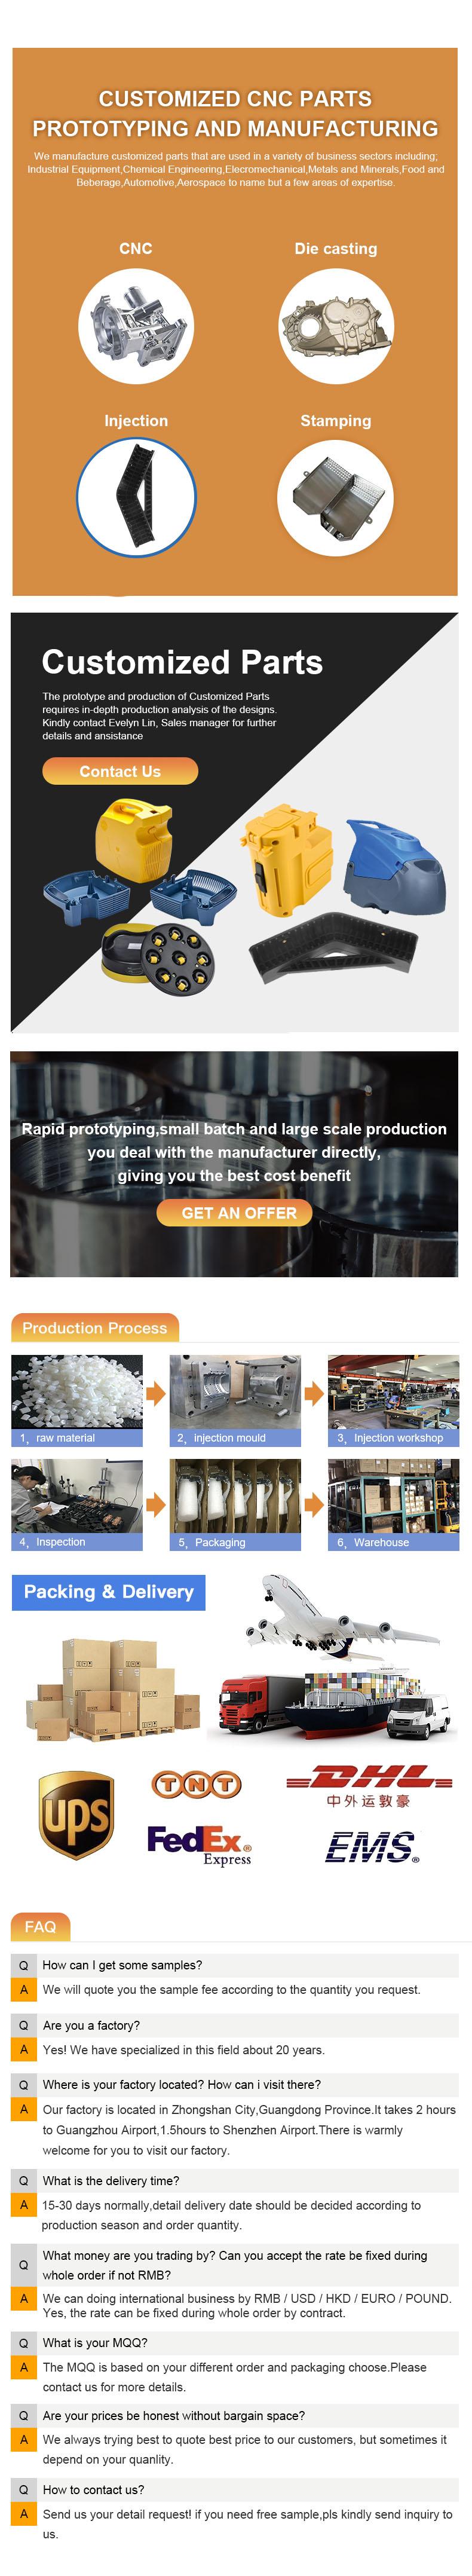 plastic injection machine parts,CNC MACHINING PARTS,PRECISION CNC MACHINING PARTS,CNC ALUMINUM PARTS,Machined Products,CNC Machined Products,BoYang Hardware Products